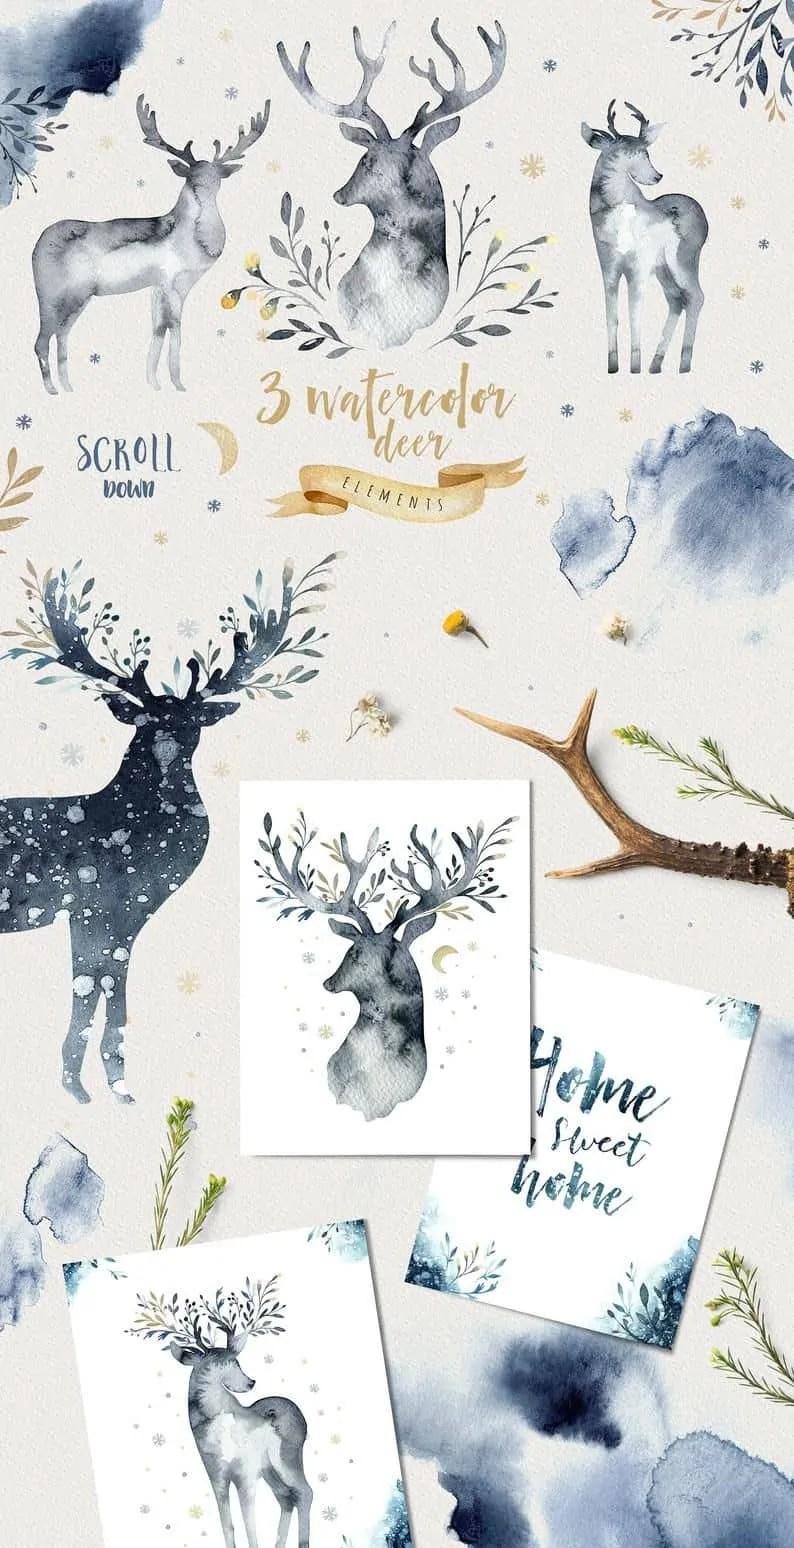 Watercolor-indigo-deer-horn-Clipart-animal-christmas-clip-art-new-year-winter-tree-texture-grange-watercolor-holly-jolly-digital-card 5